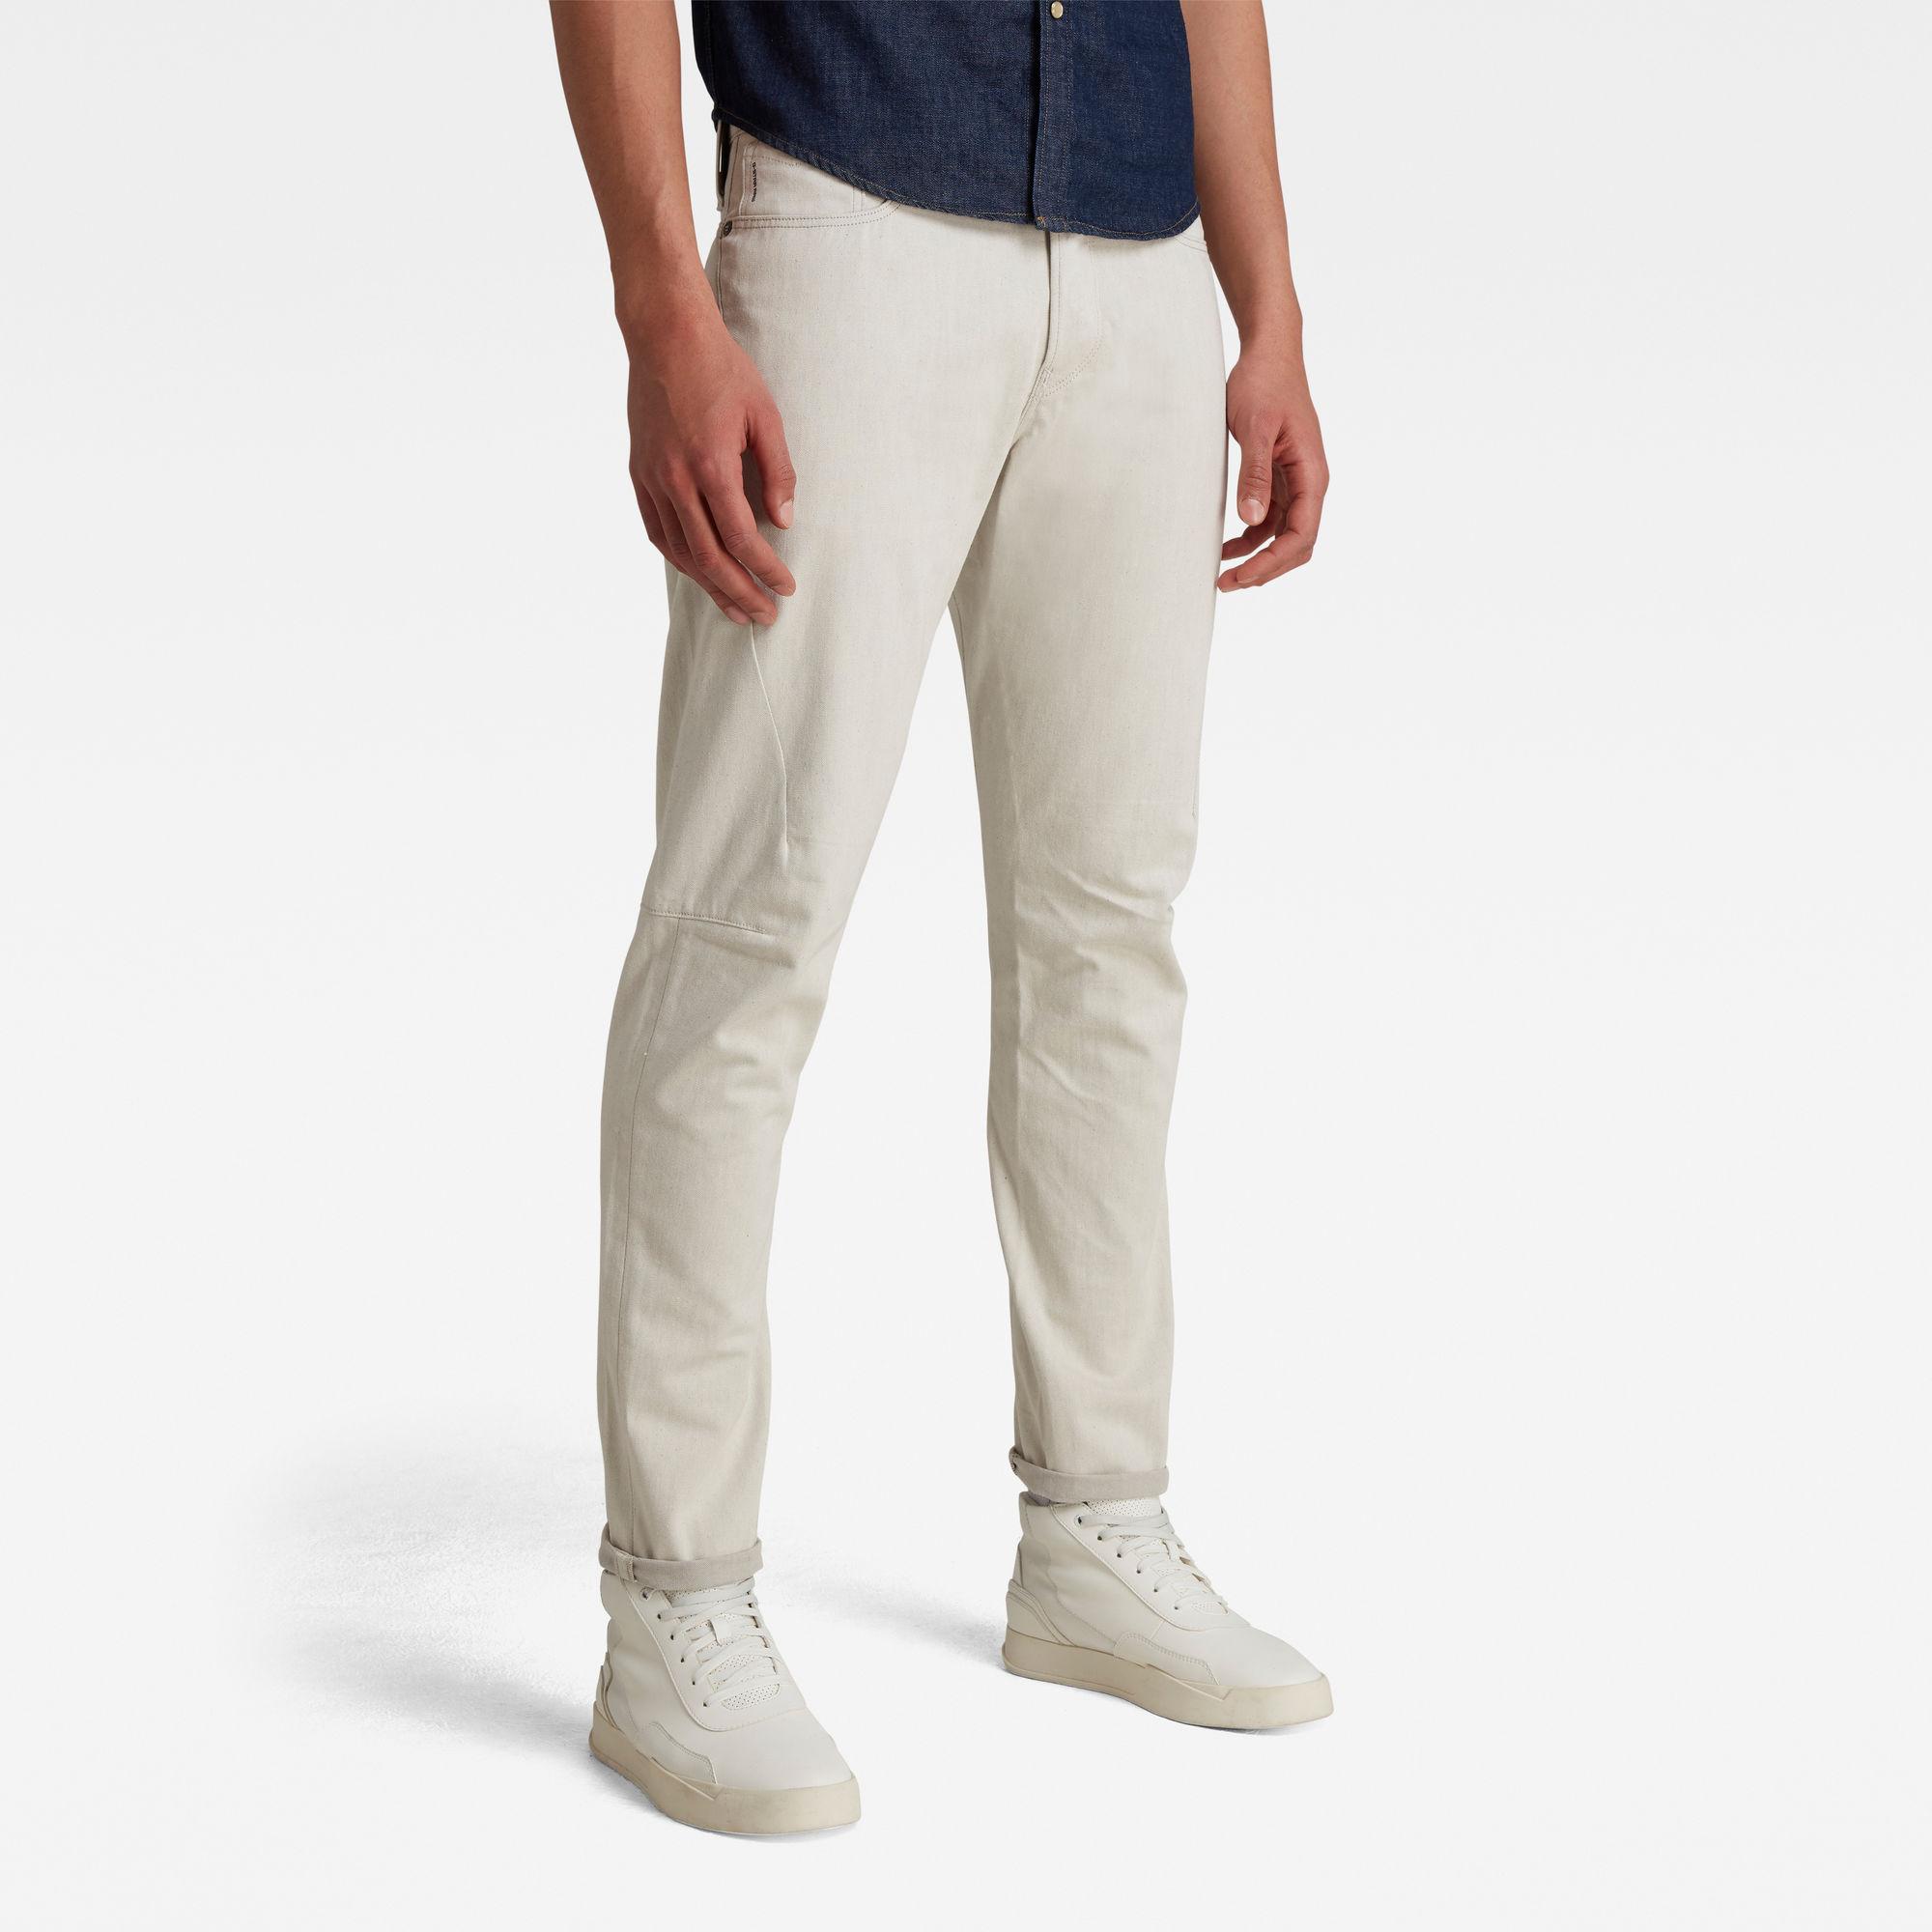 G-Star RAW Heren Scutar 3D Tapered Jeans Beige